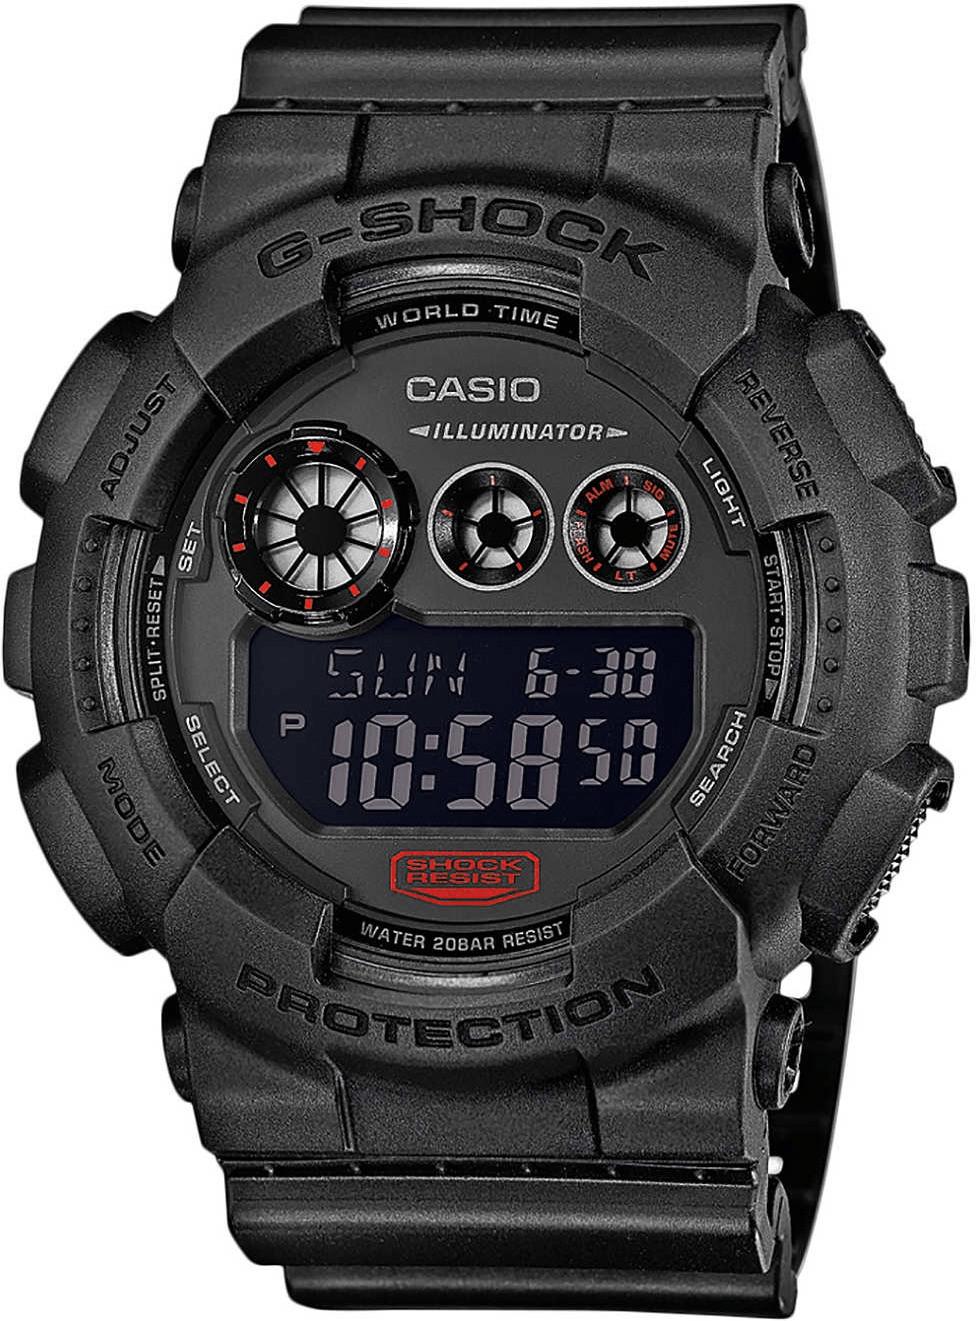 Casio G-Shock (GD-120MB-1ER)